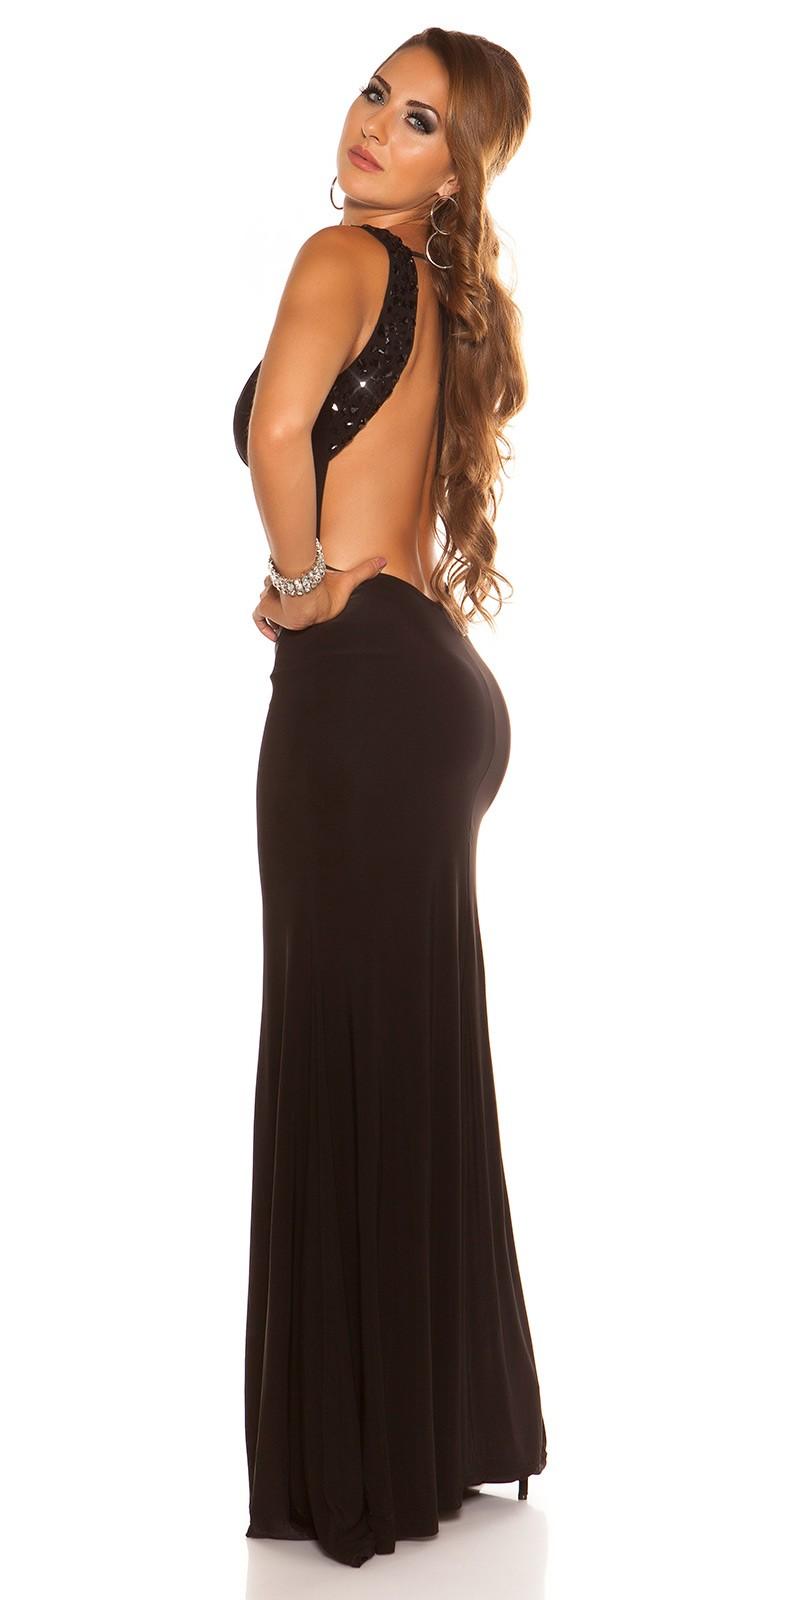 d91642dfe2a7 ooKouCla gown backless with Rhinstones  Color BLACK Size Einheitsgroesse 0000K18272-N SCHWARZ 17  · Dlhe spolocenske saty s odhalenym chrbtom